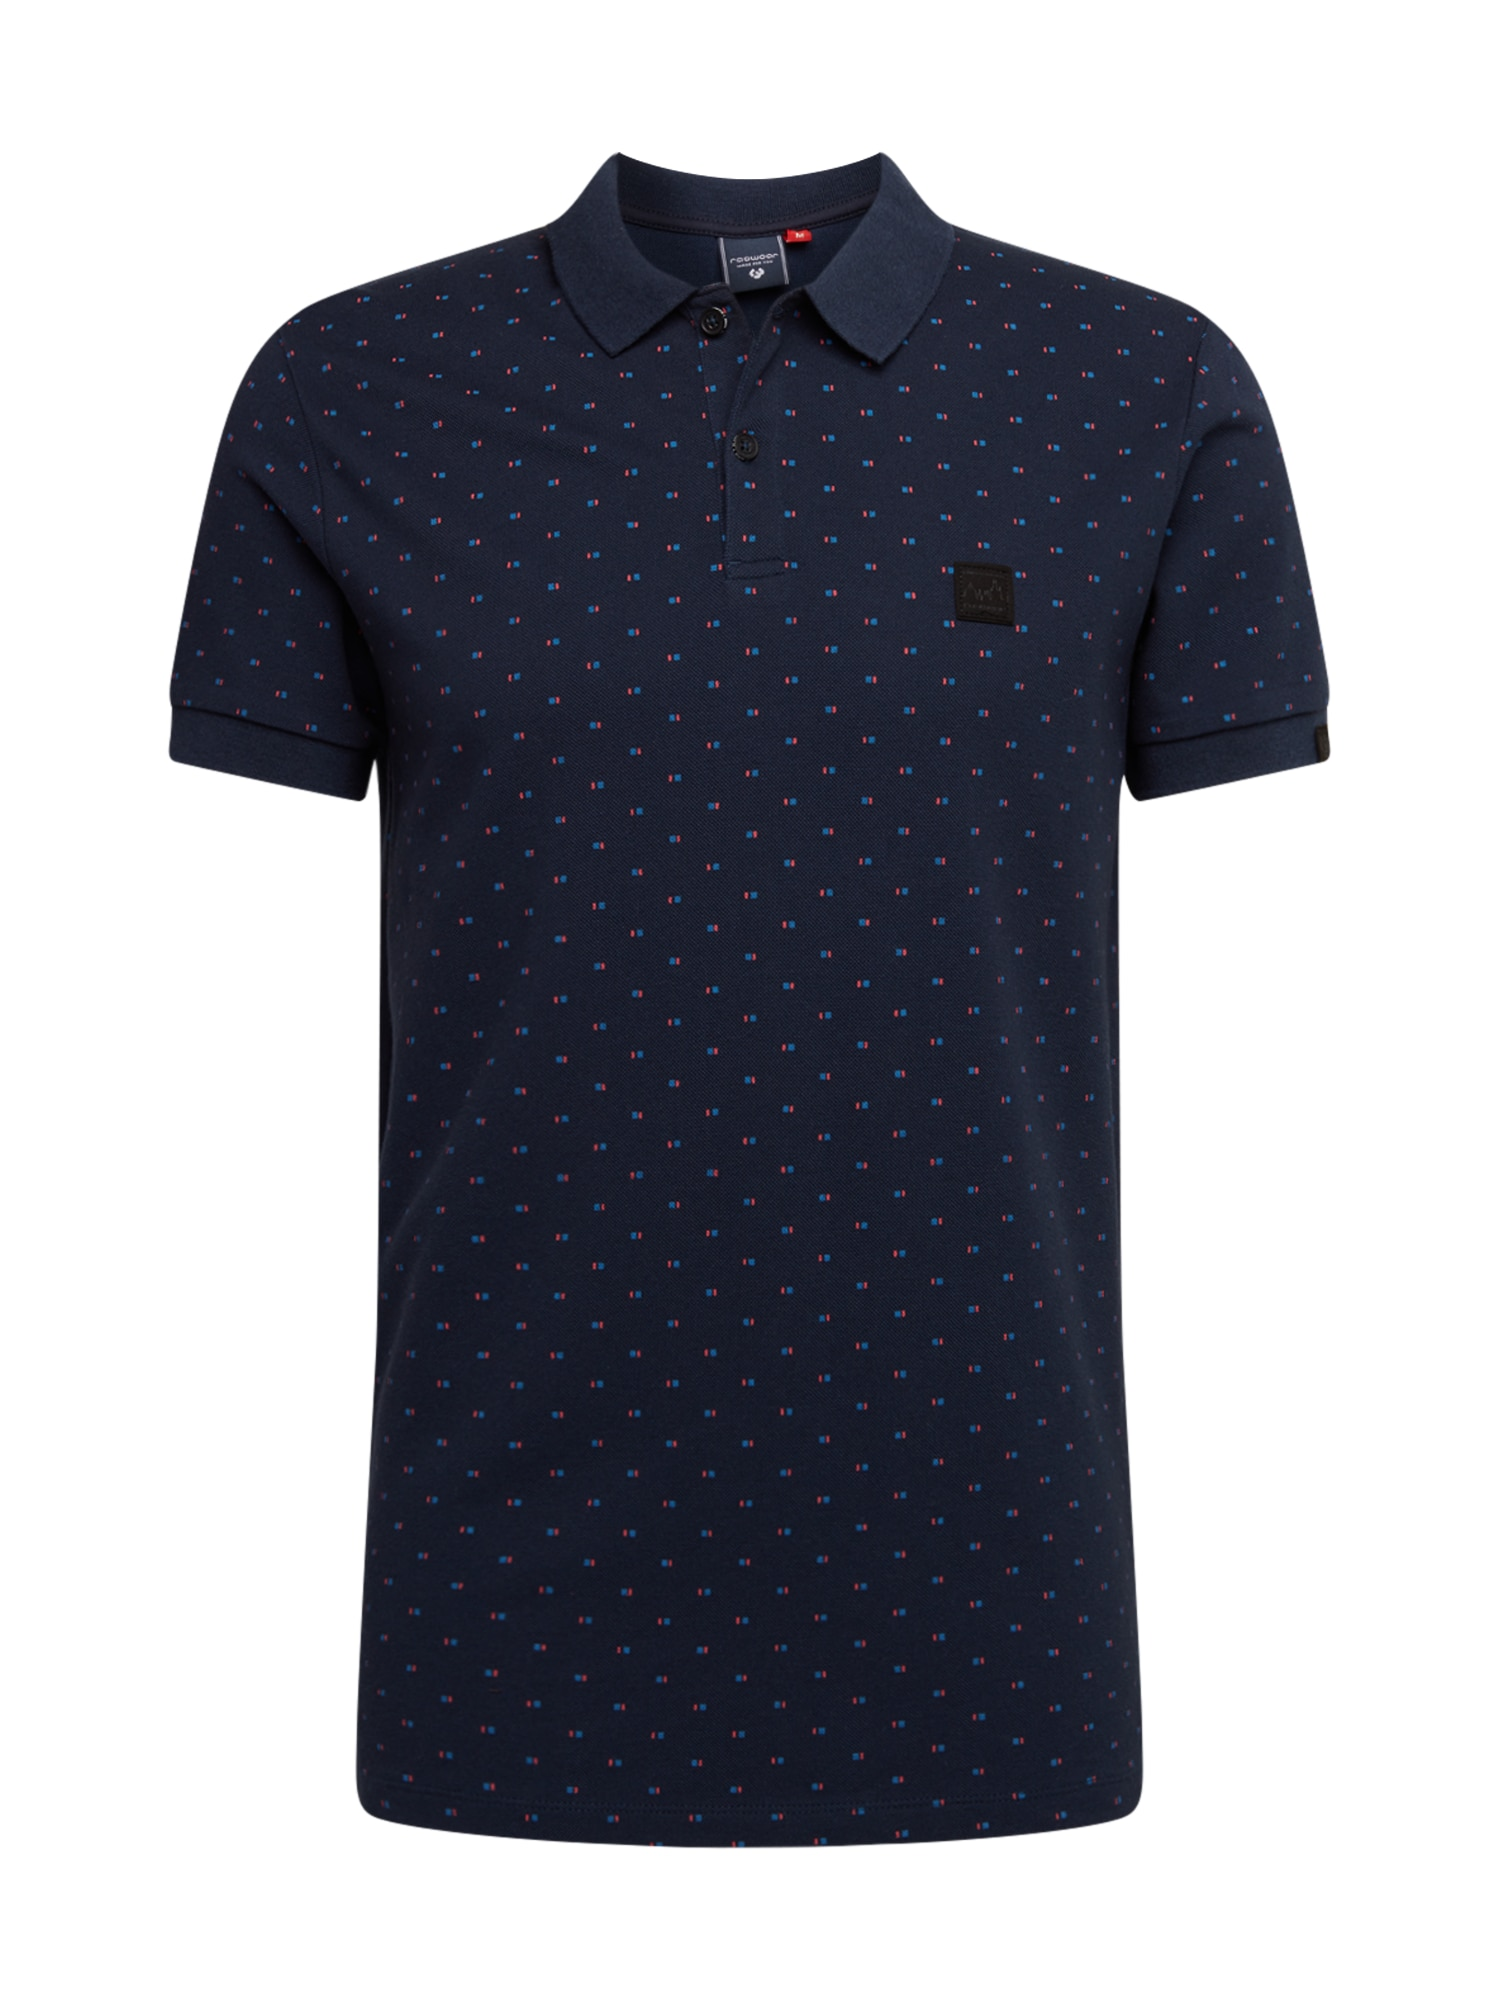 Ragwear Tričko 'MARNY'  námořnická modř